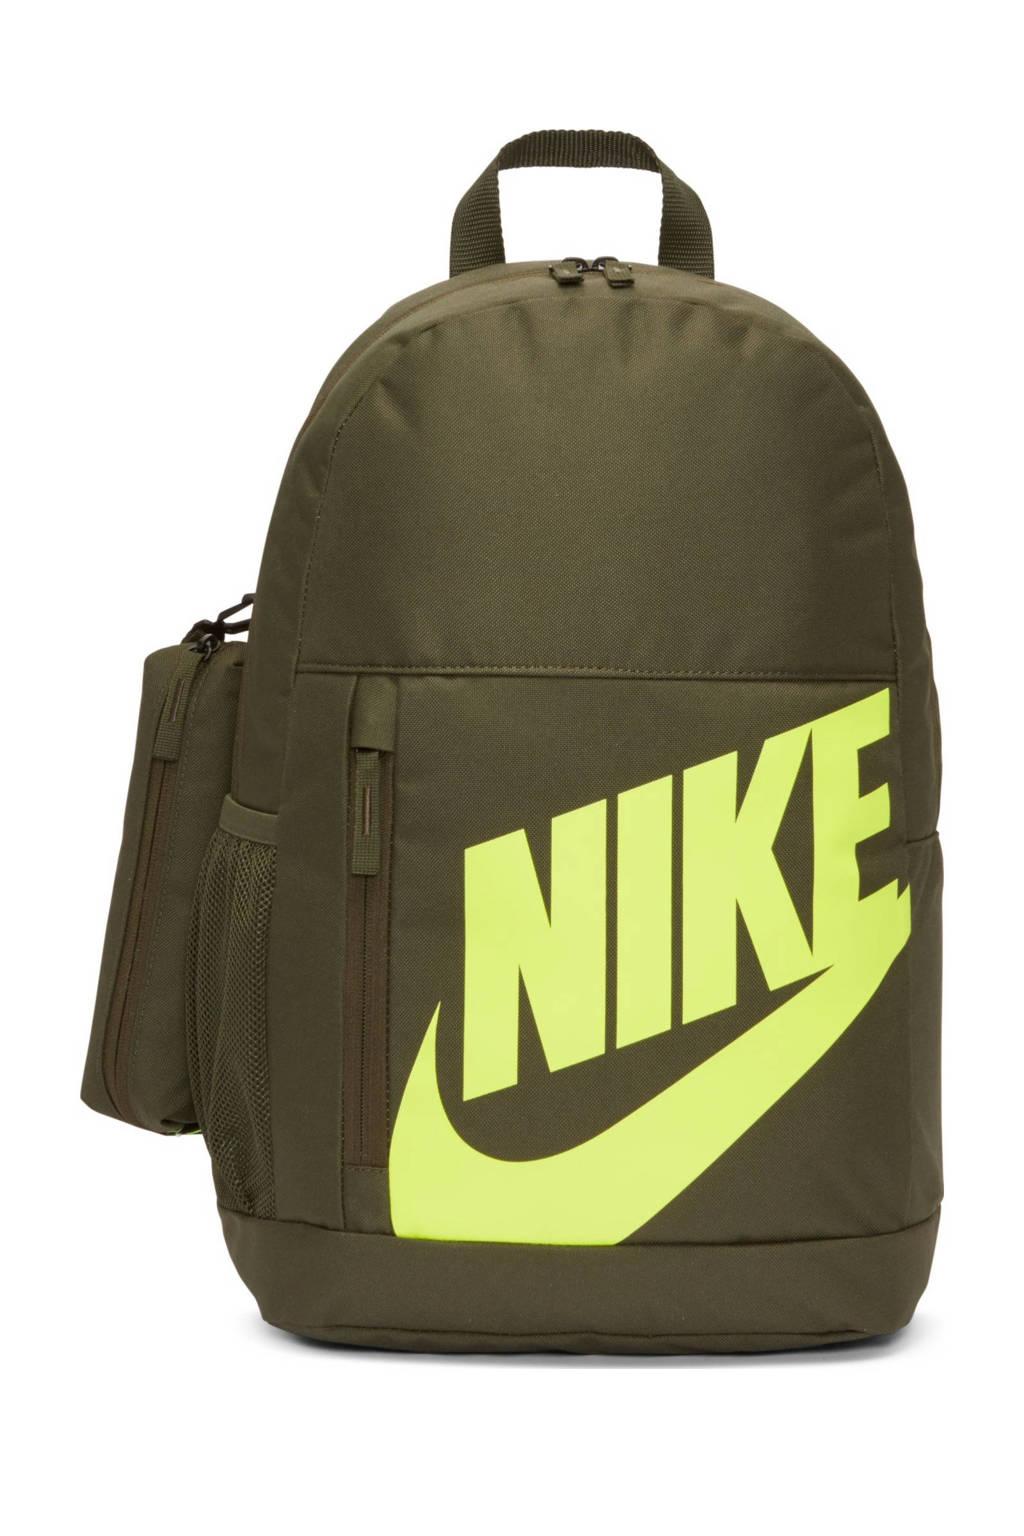 Nike rugzak Elemental kaki/geel, Kaki/geel